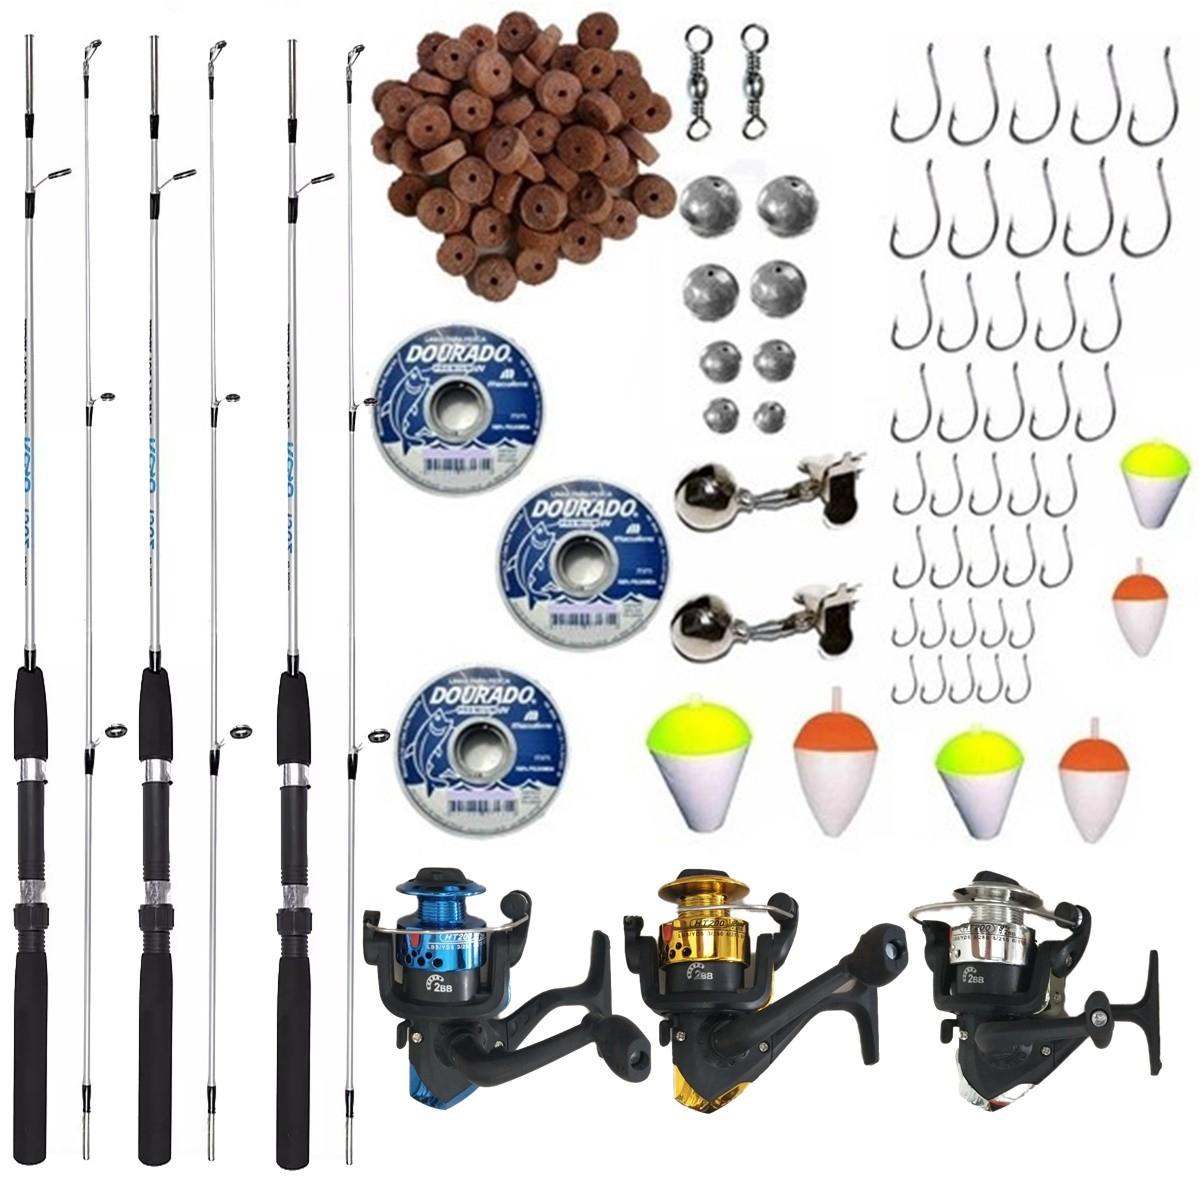 Kit De Pesca Completo Suporta 8kg 3 Vara 1,50 3 Molinetes + Itens